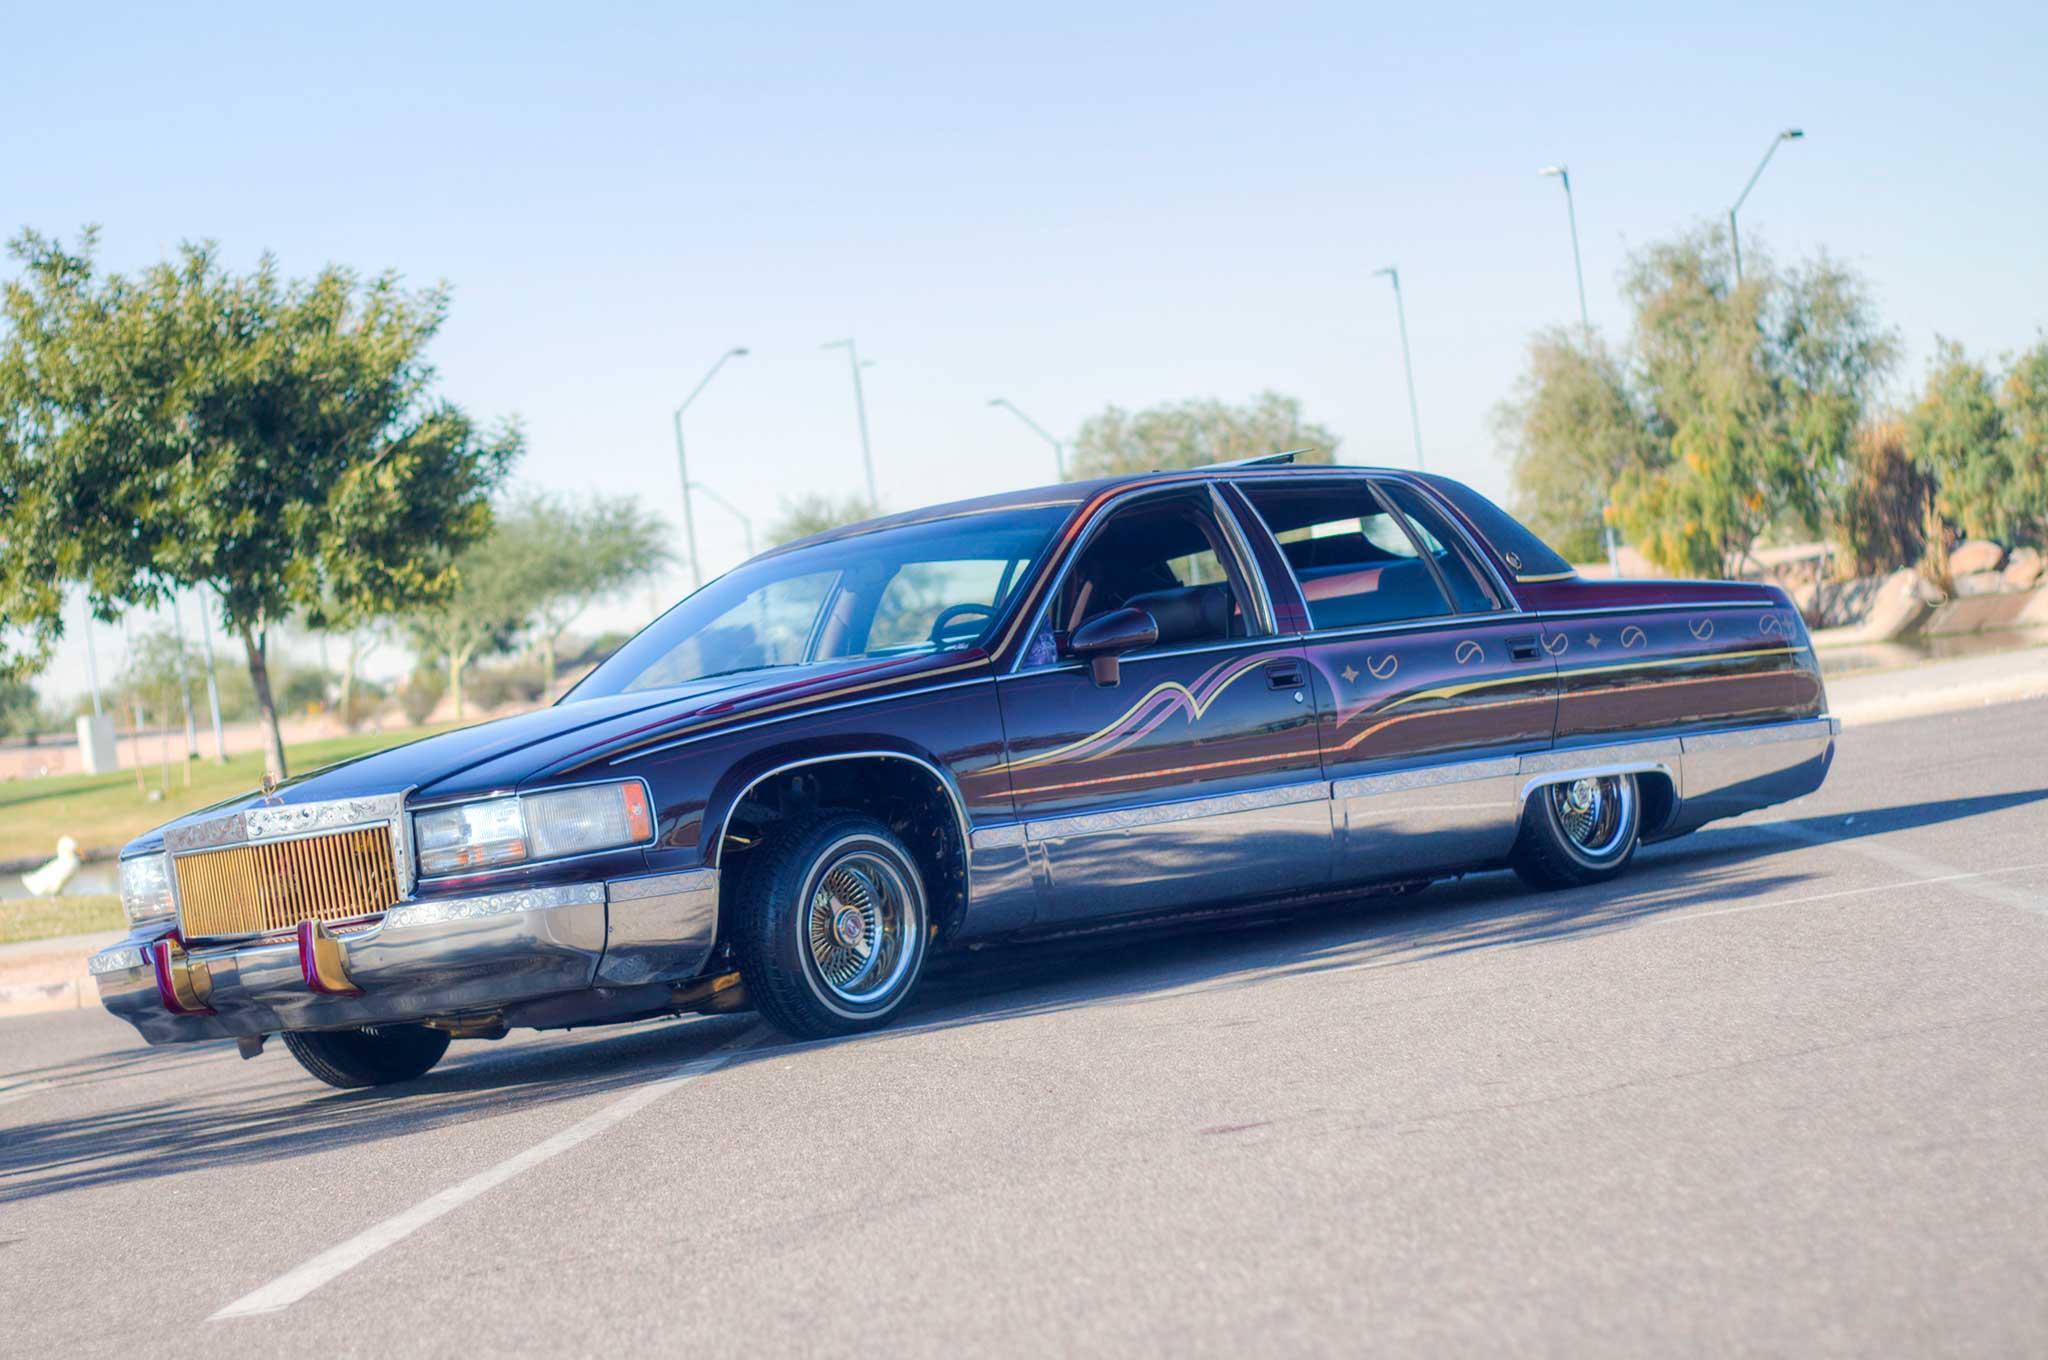 '93 Cadillac Fleetwood & '84 Oldsmobile Cutlass - The Game ...